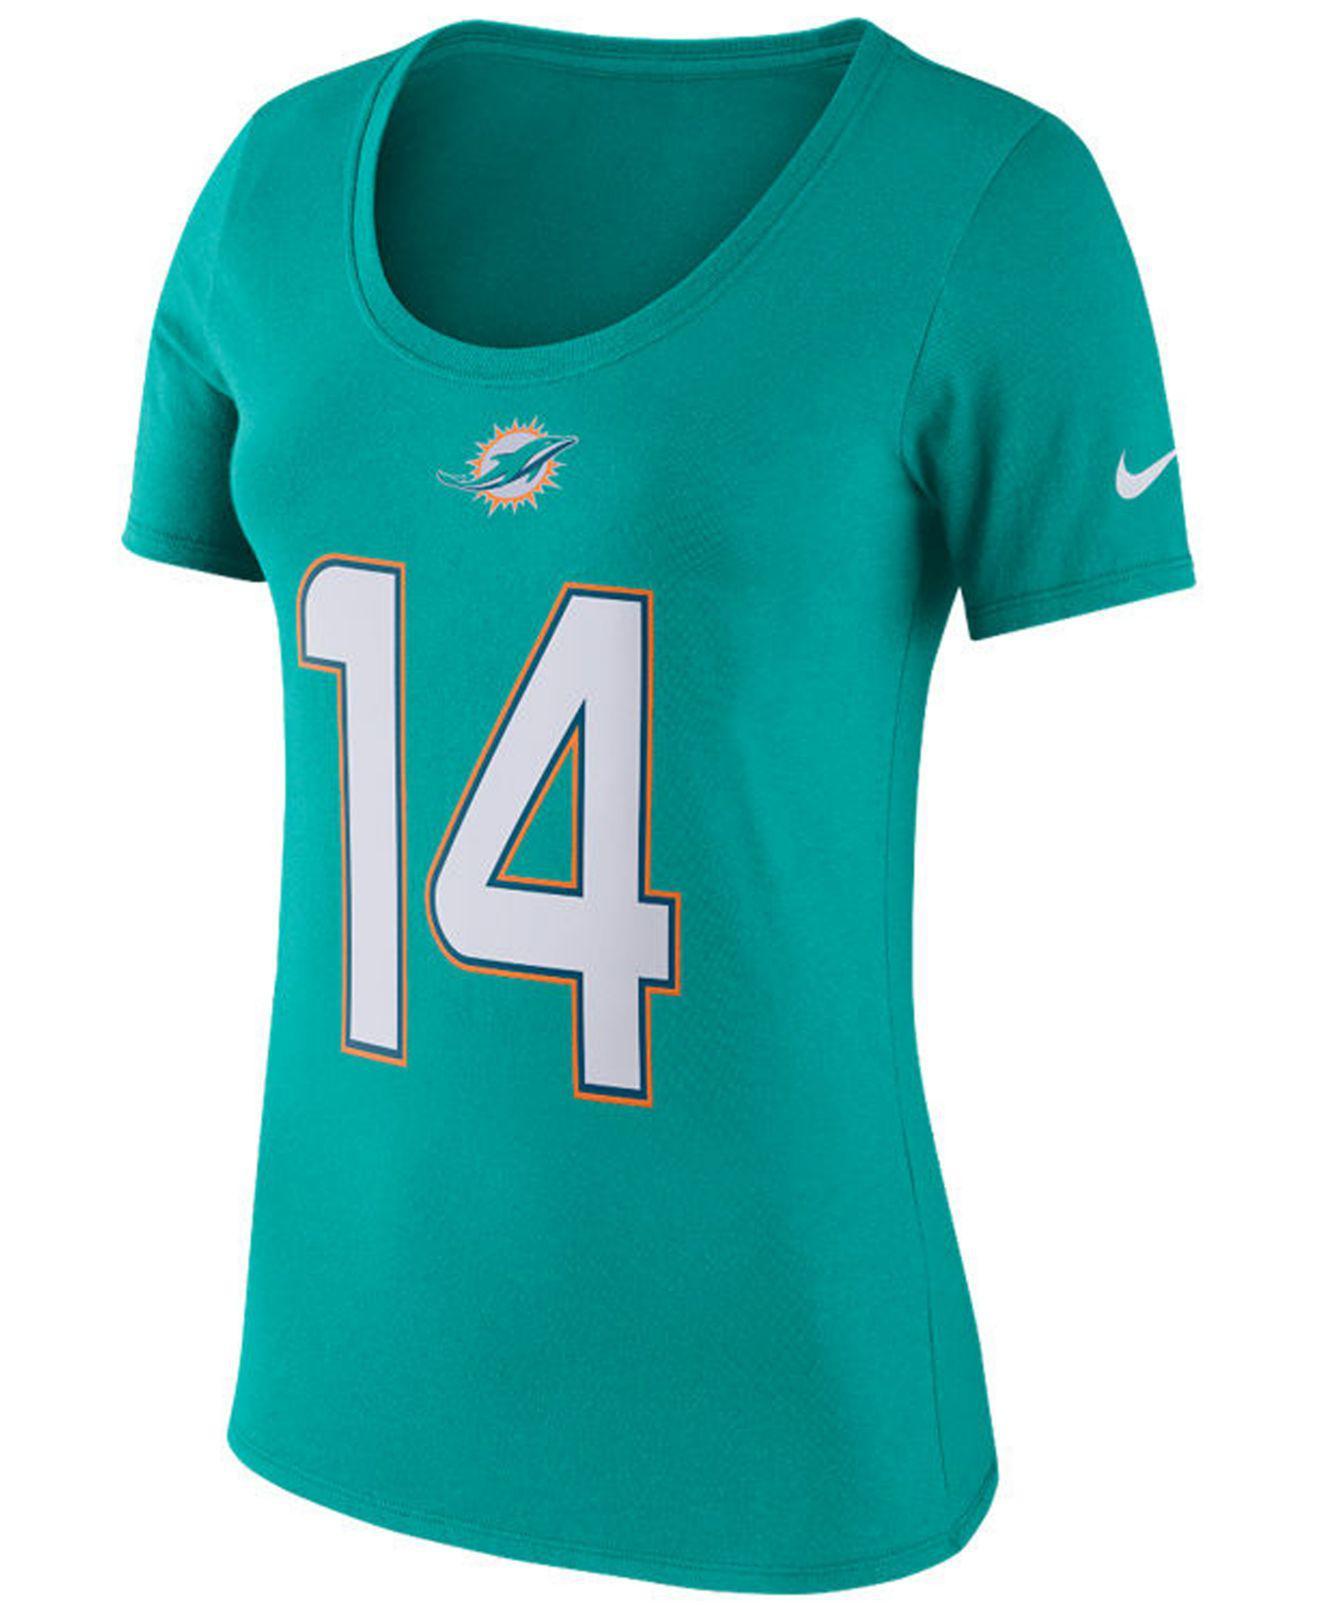 29e07358 Nike - Blue Women's Player Pride T-shirt - Lyst